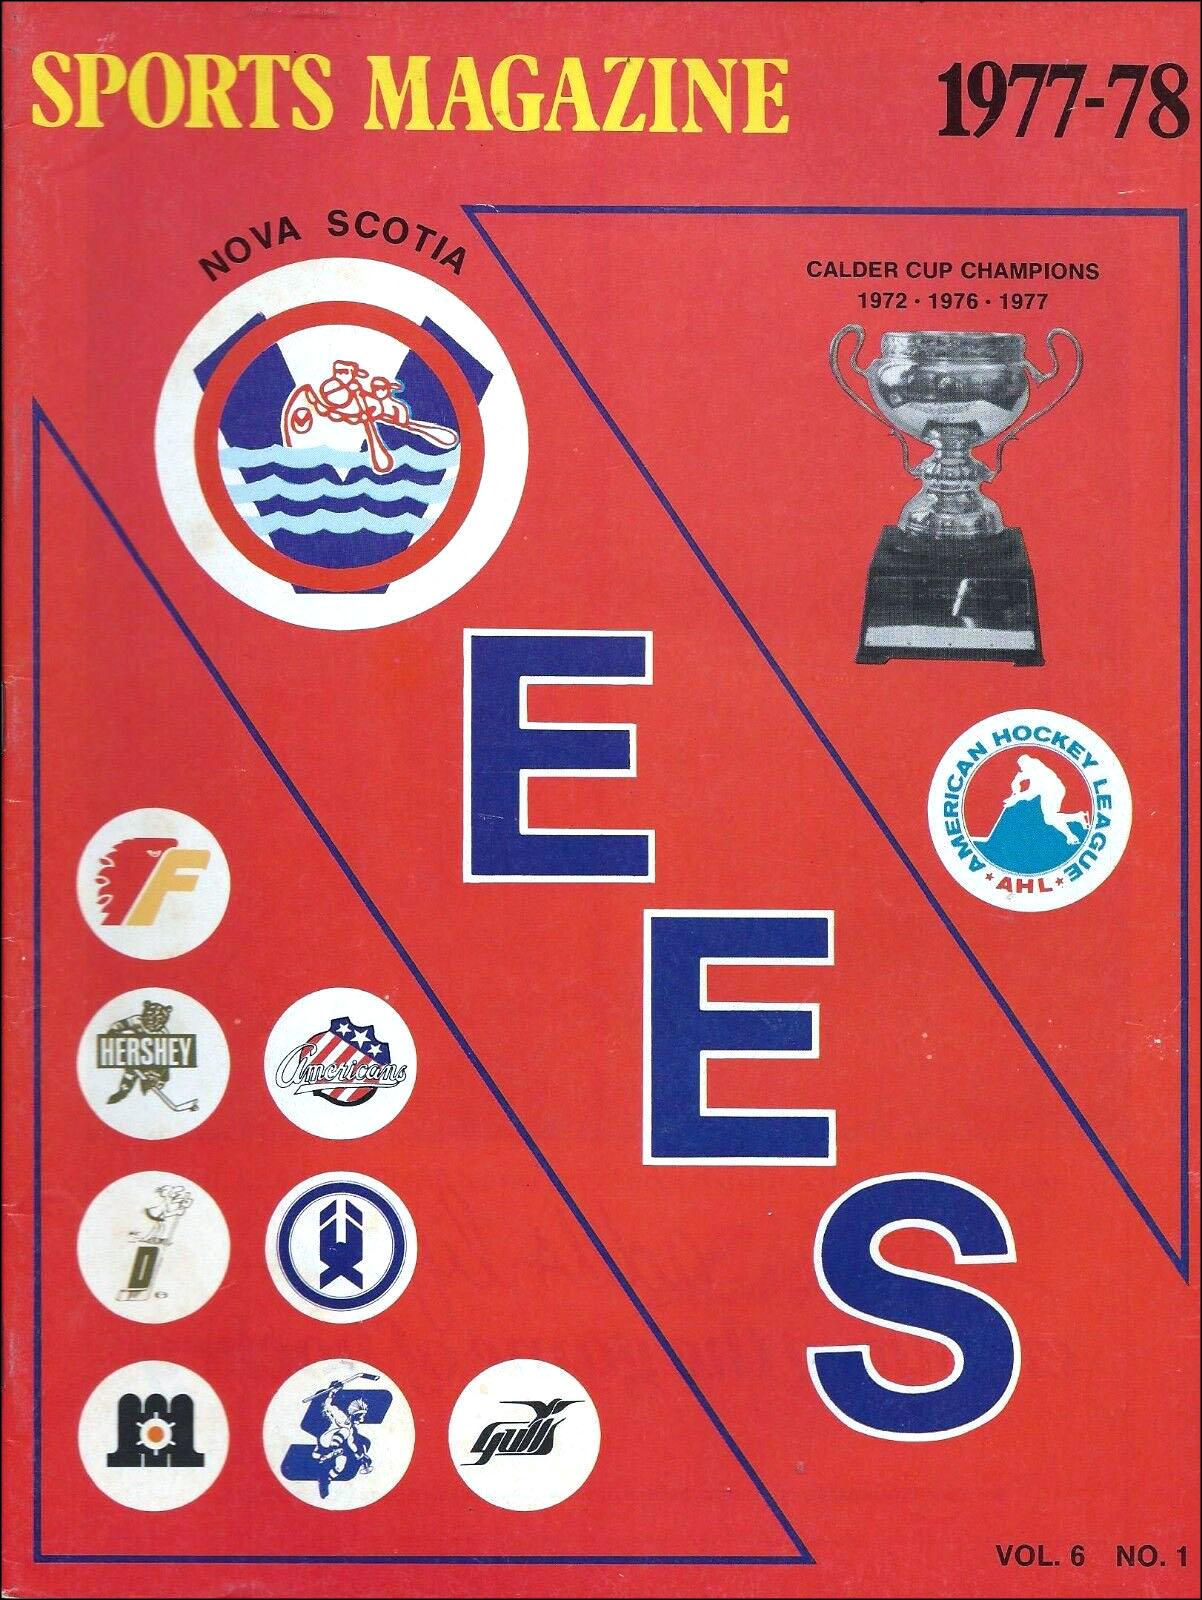 Nova Scotia Voyageurs AHL program, 1977-78